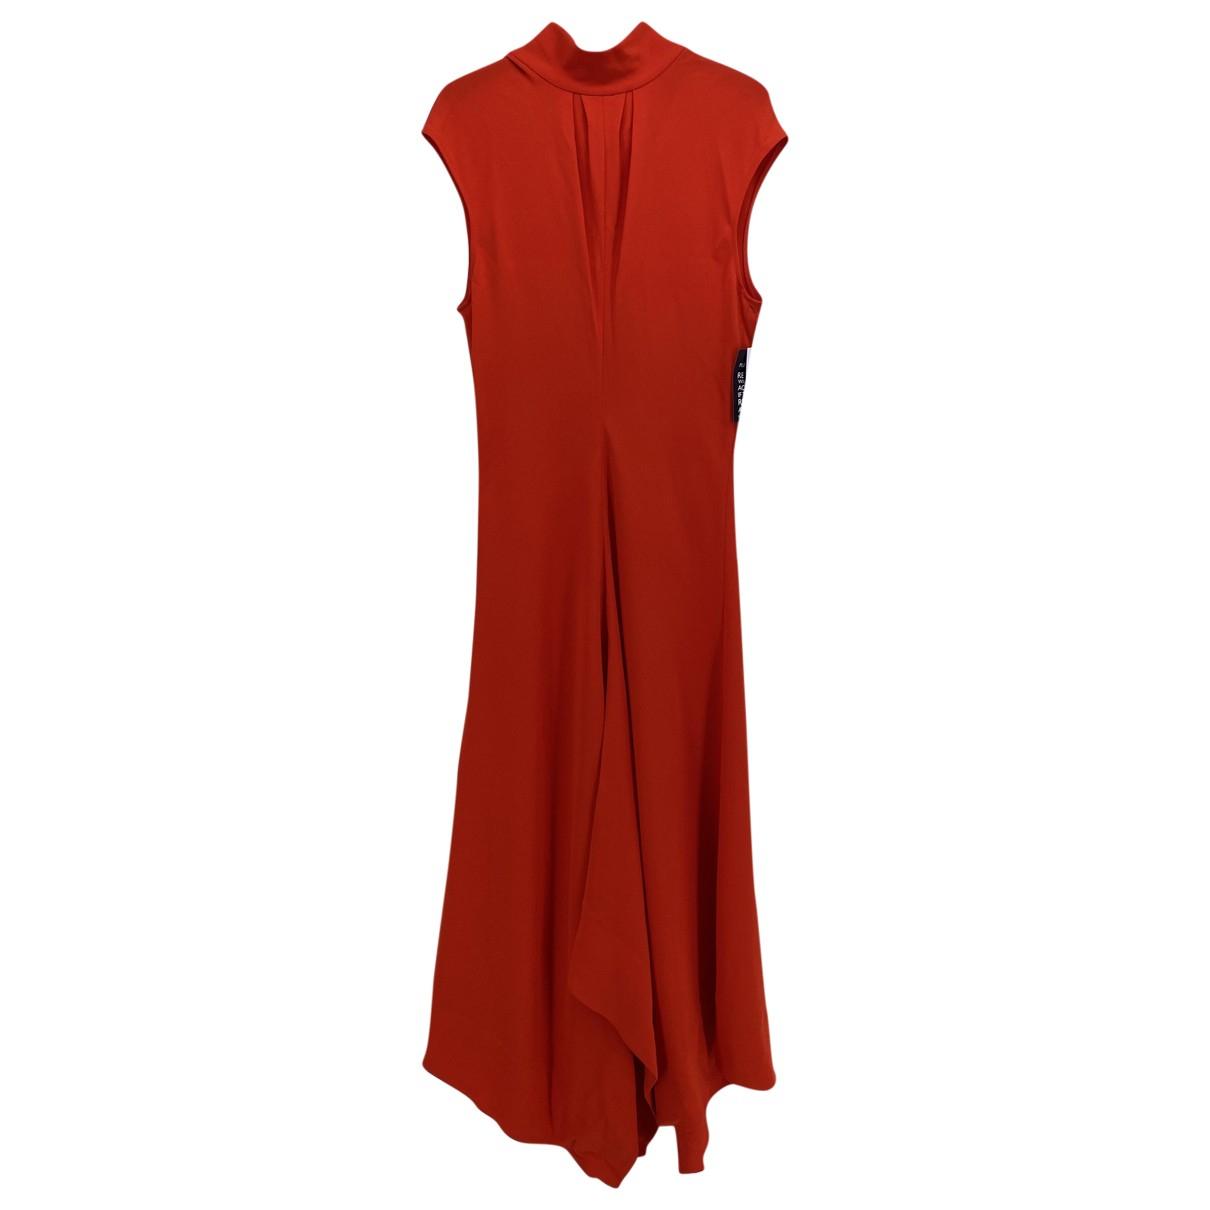 Proenza Schouler \N Kleid in  Rot Synthetik